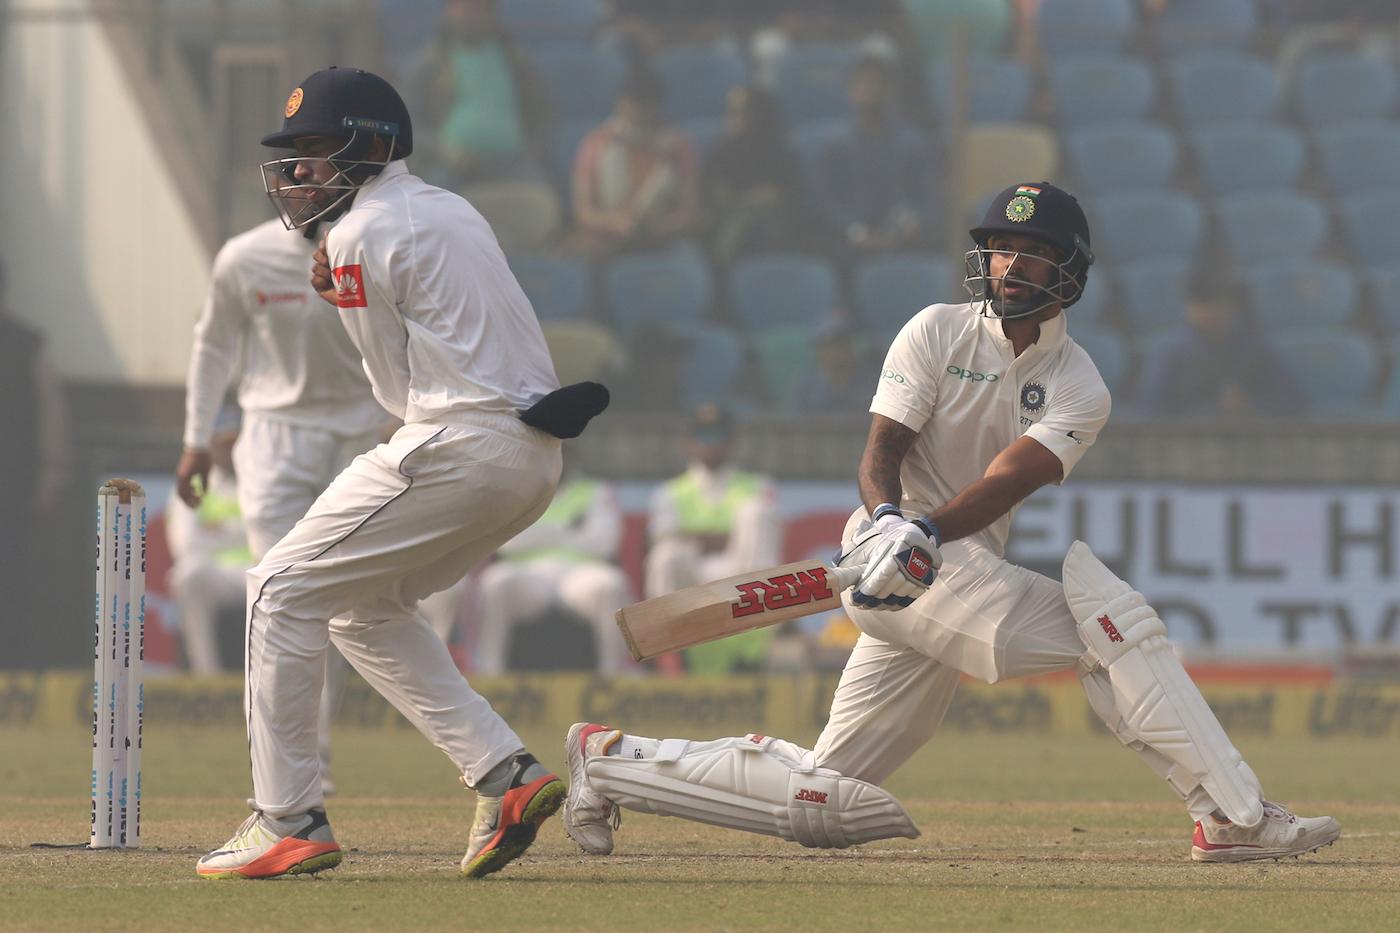 Cricket, India, Sri Lanka, Shikhar Dhawan, Suranga Lakmal